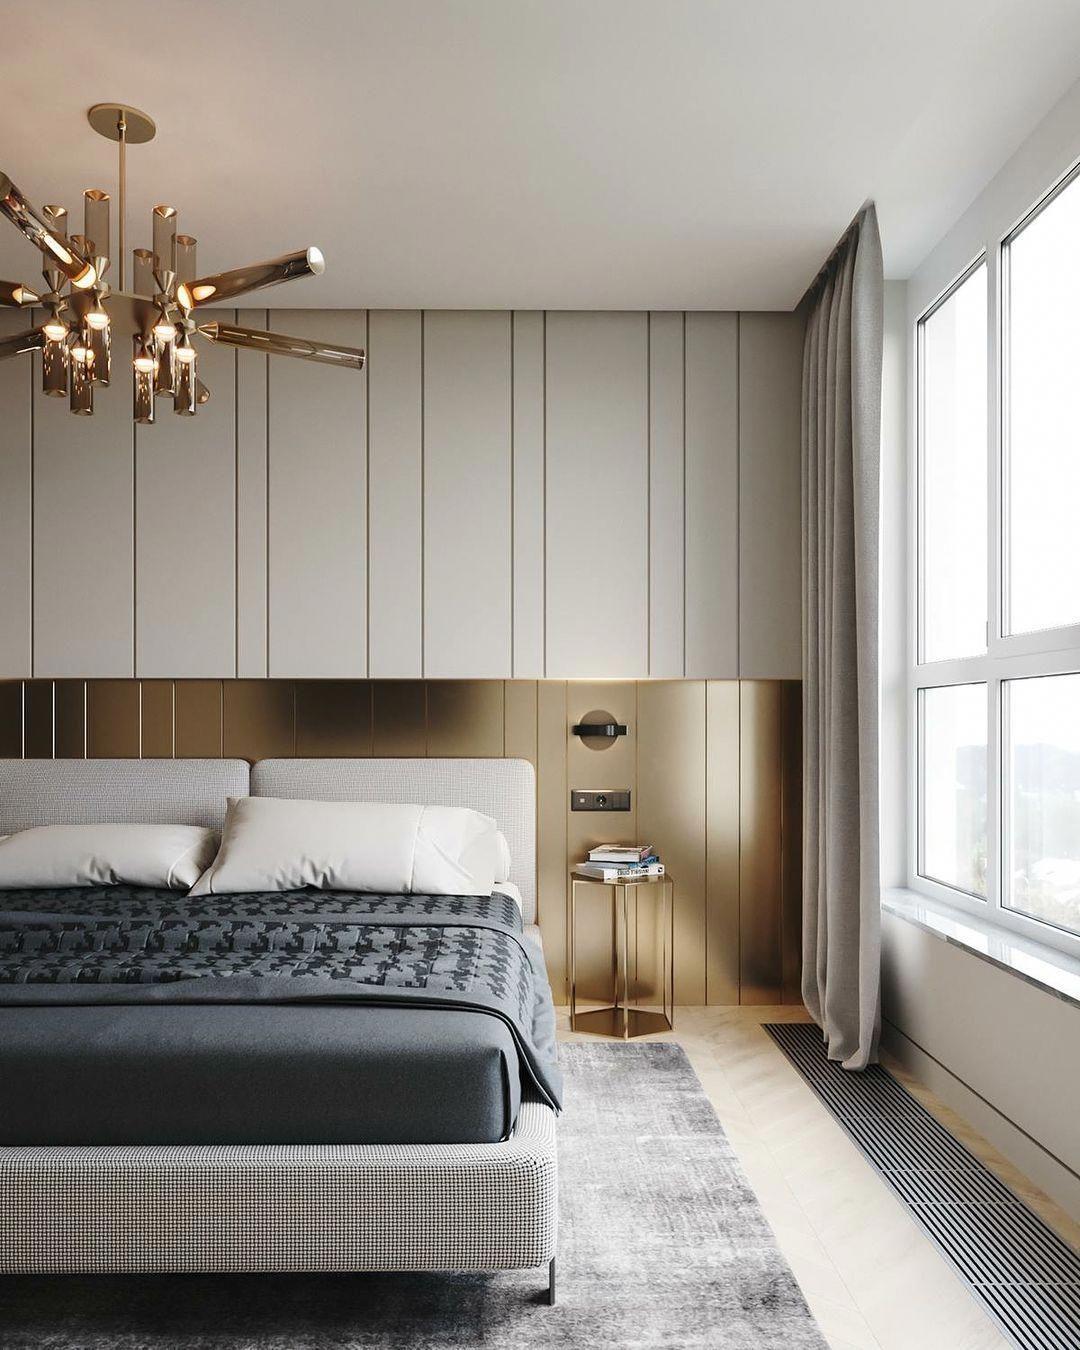 49 Unique Bedroom Lamp Designs Ideas | Home Design Hints ...